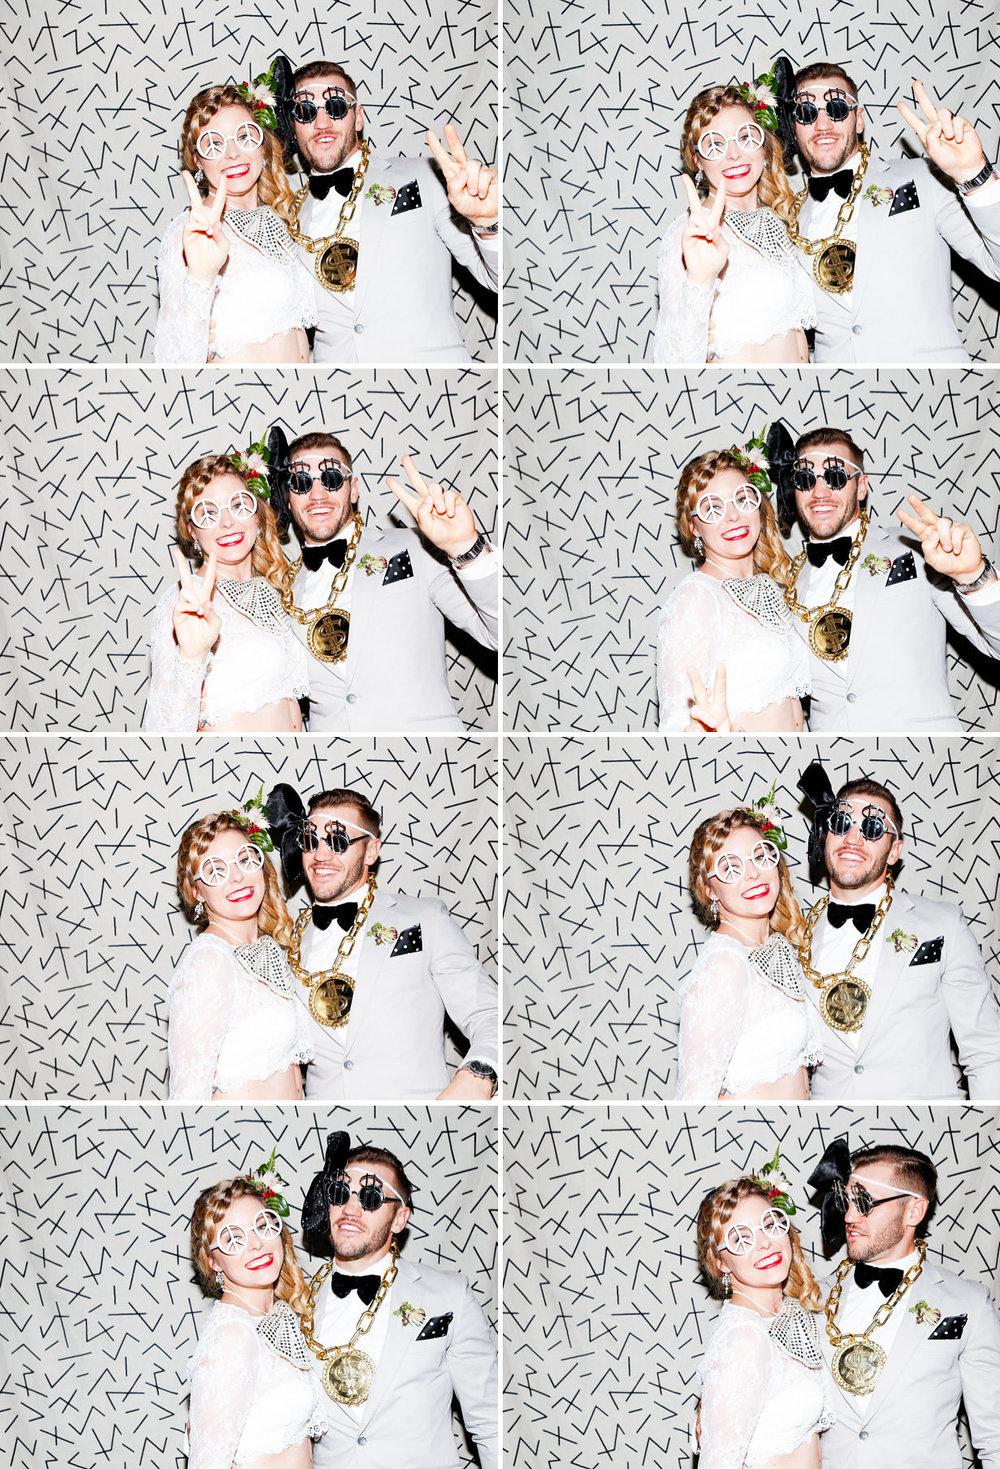 www.studiosomething.com-photobooth-Ashley+Simon-253.jpg